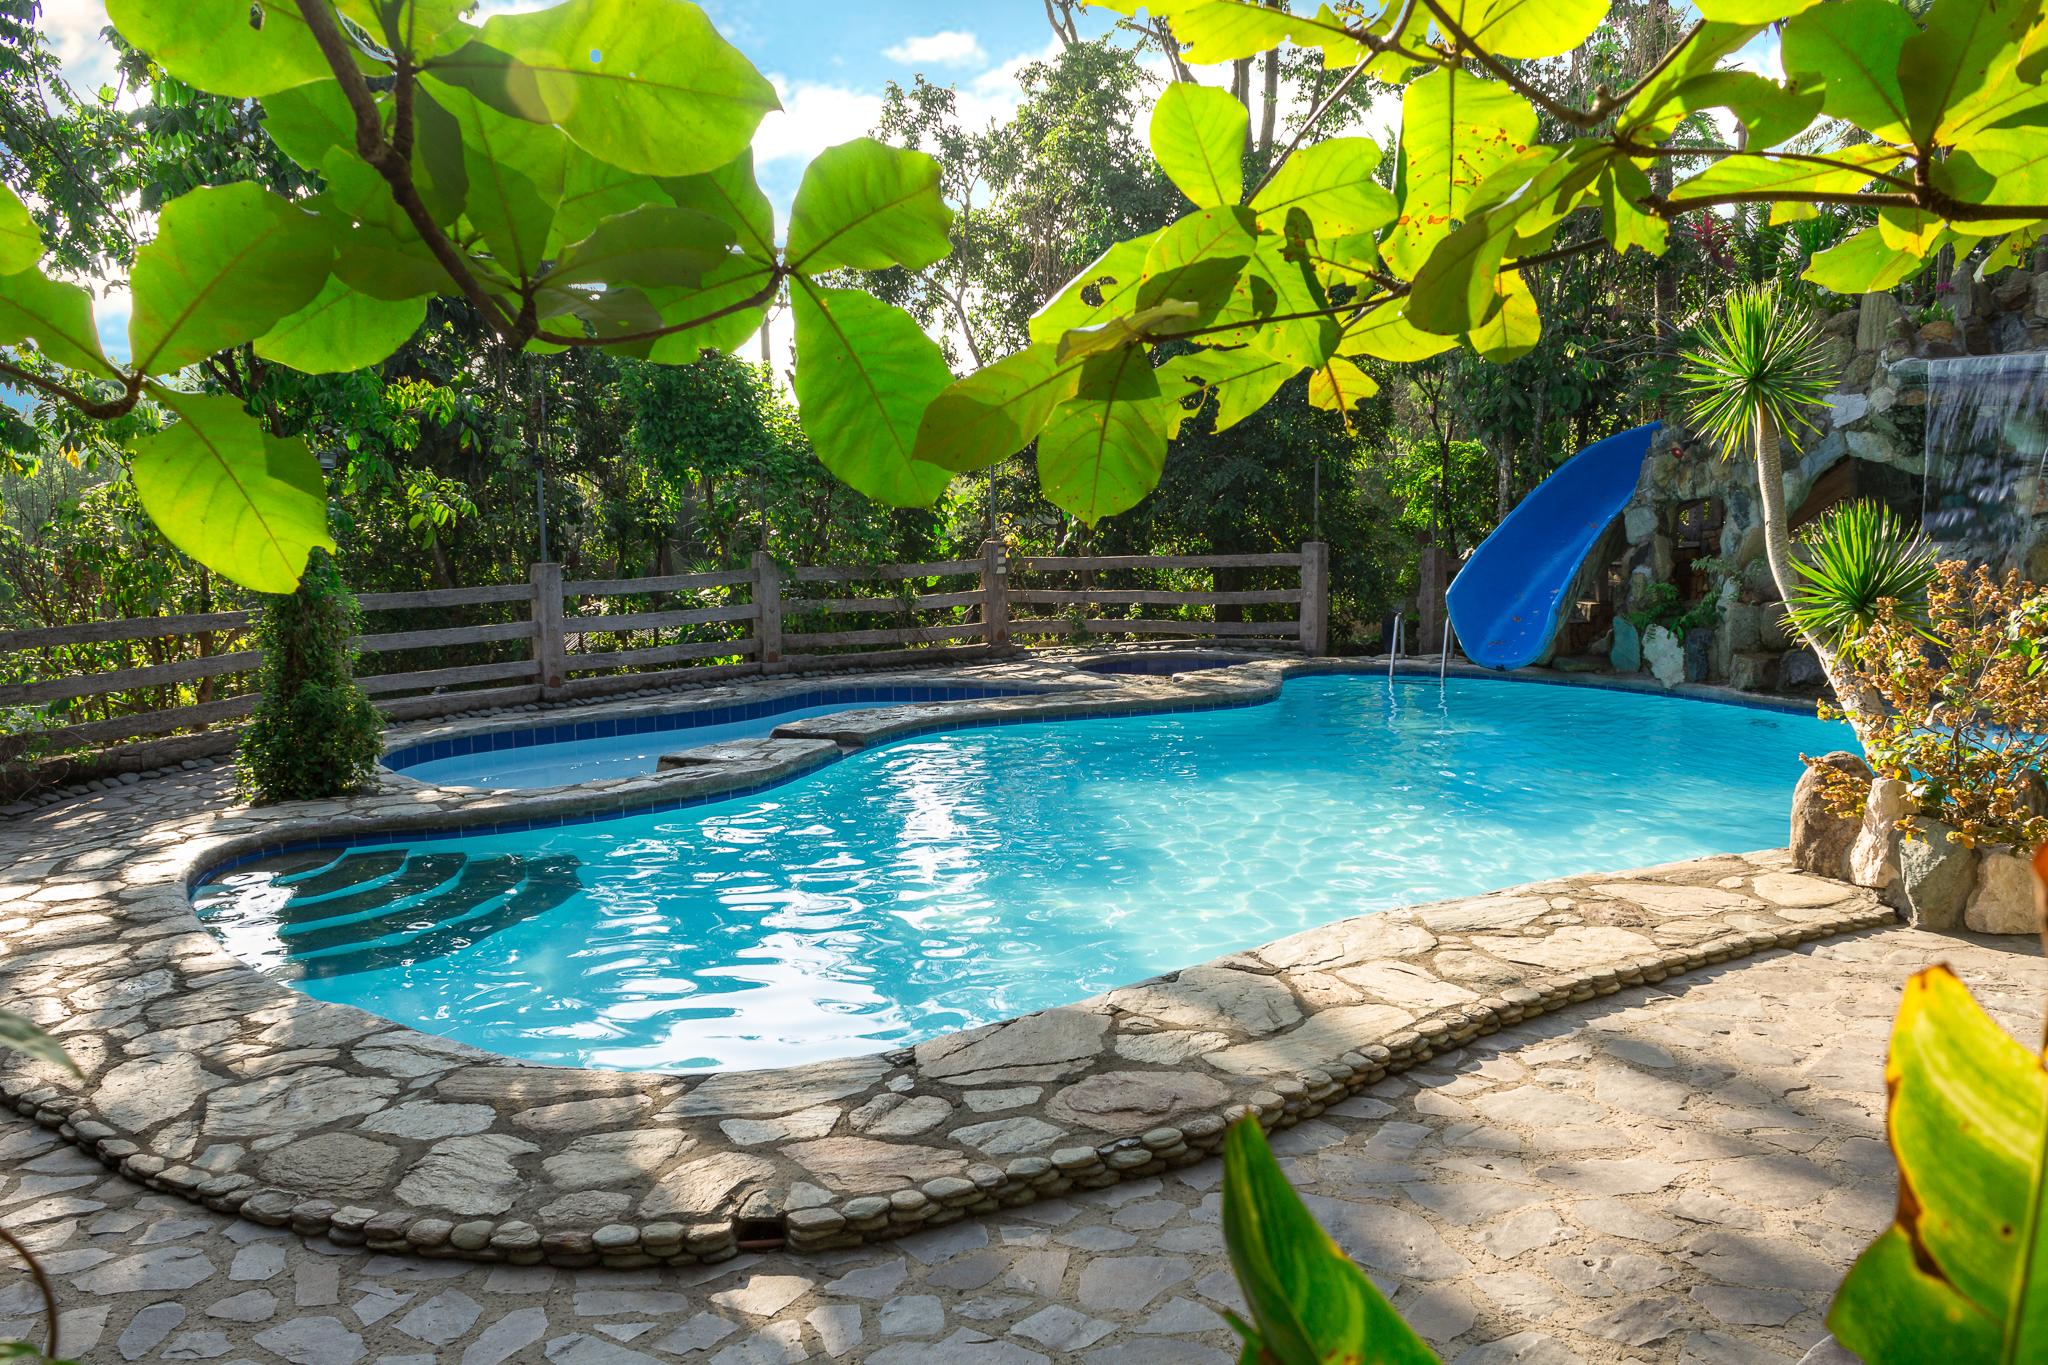 Batis Pool morning bungad biluso